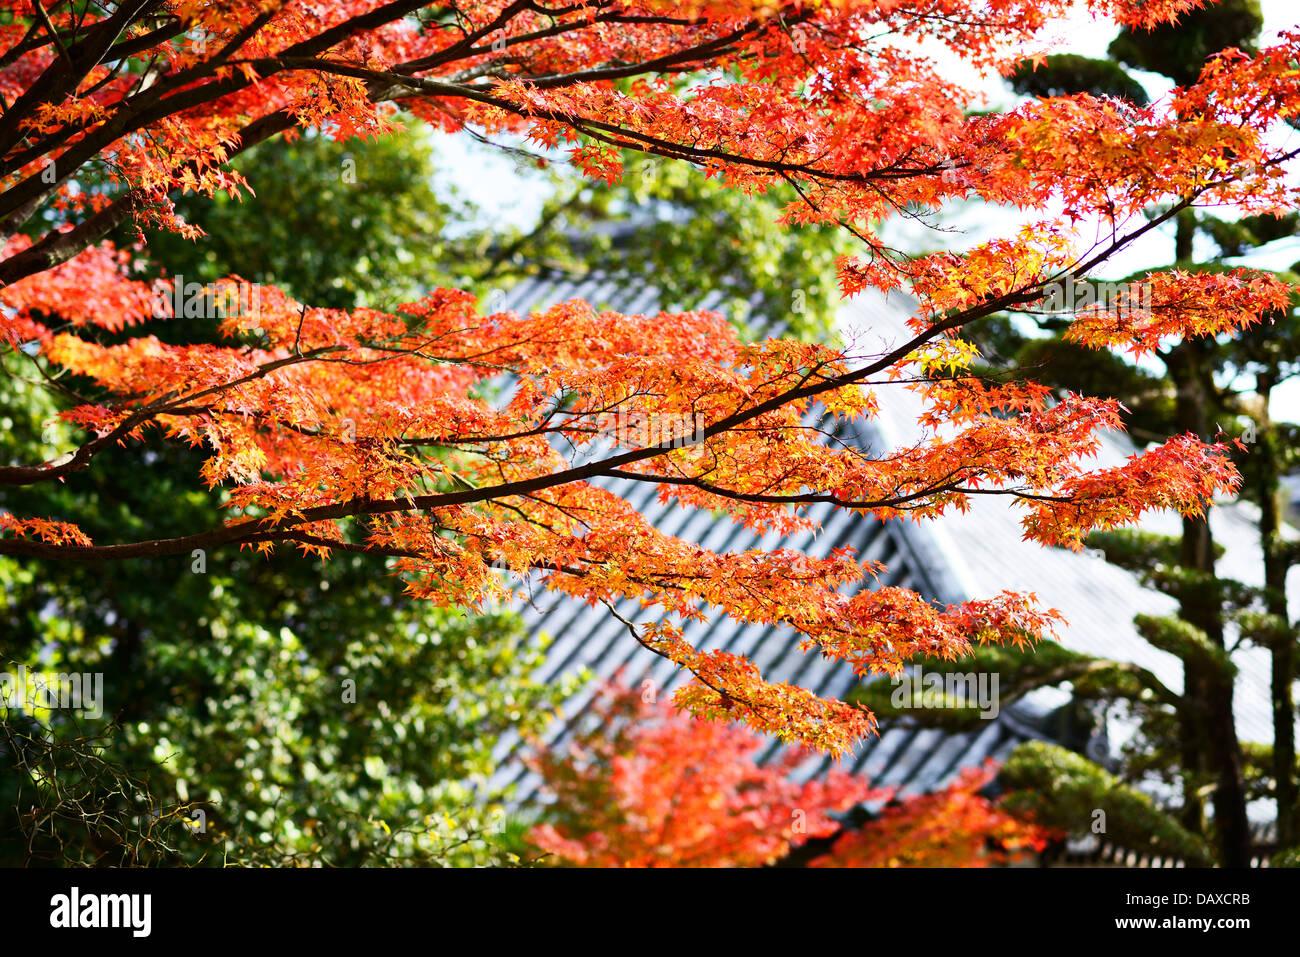 Fall Foliage in Nara, Japan. - Stock Image